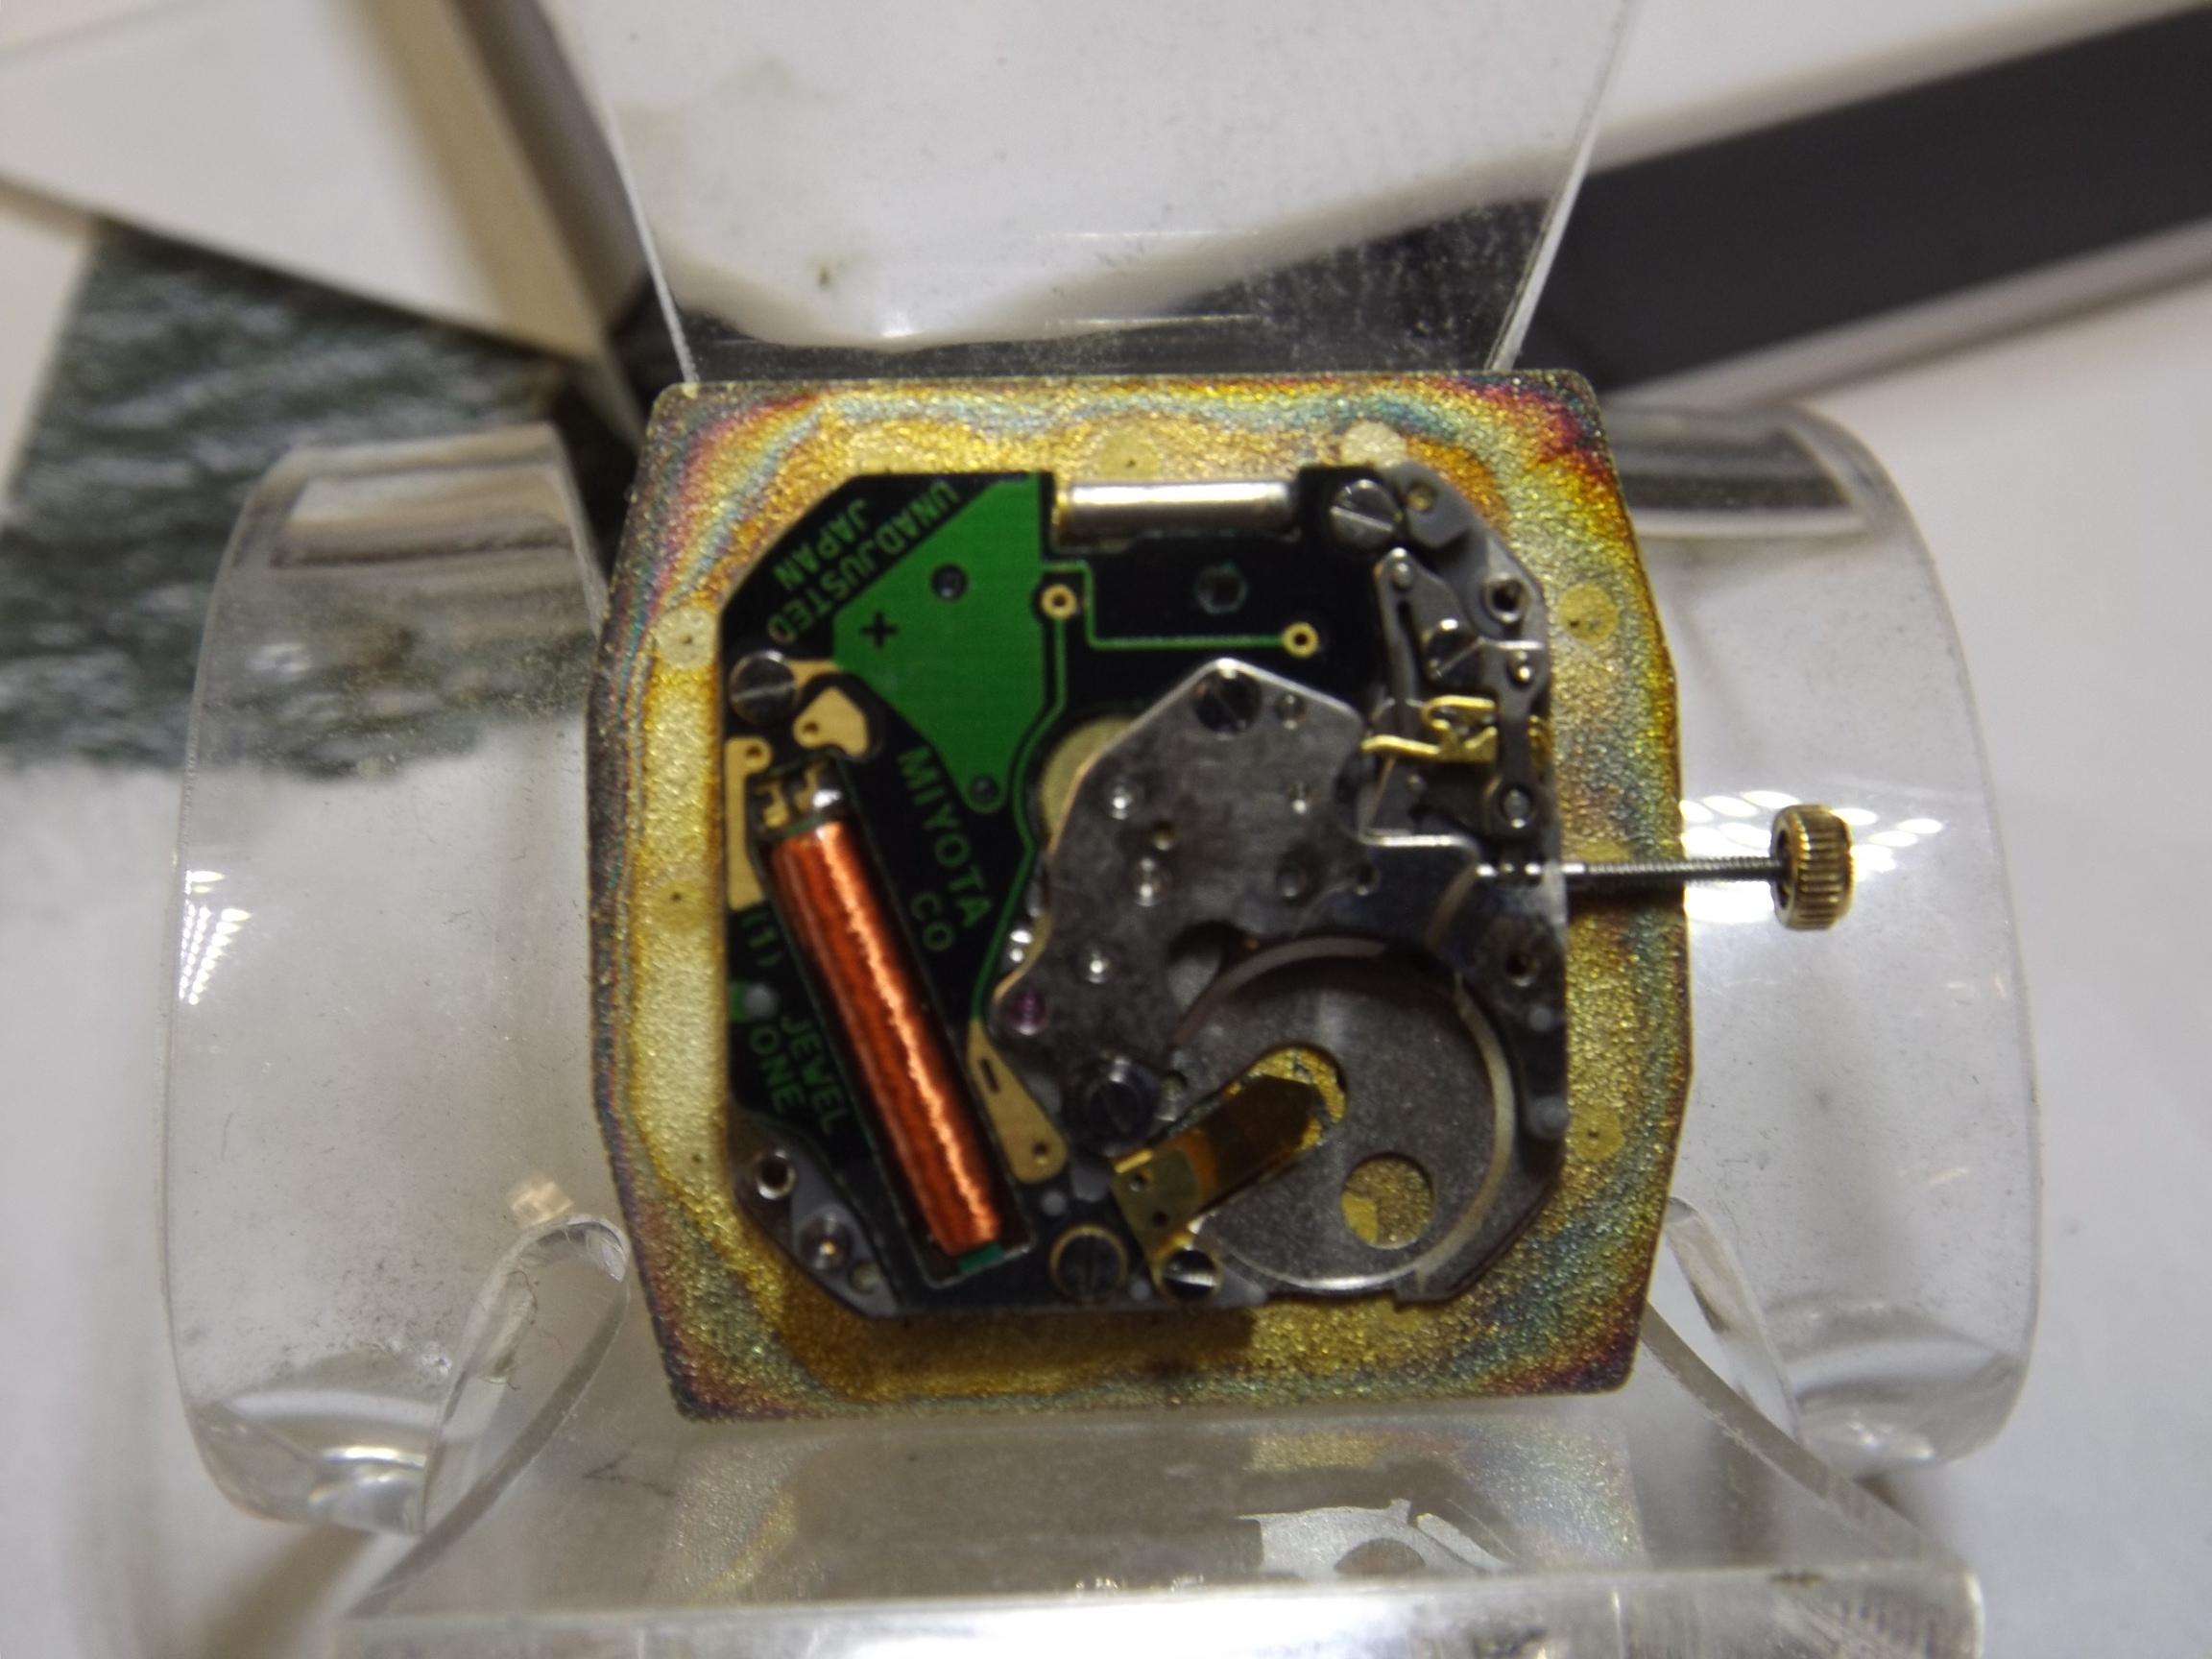 BUL6050.27 Bulova/Caravelle-Miyota 2W28- Quartz Watch Movement - Limited stock